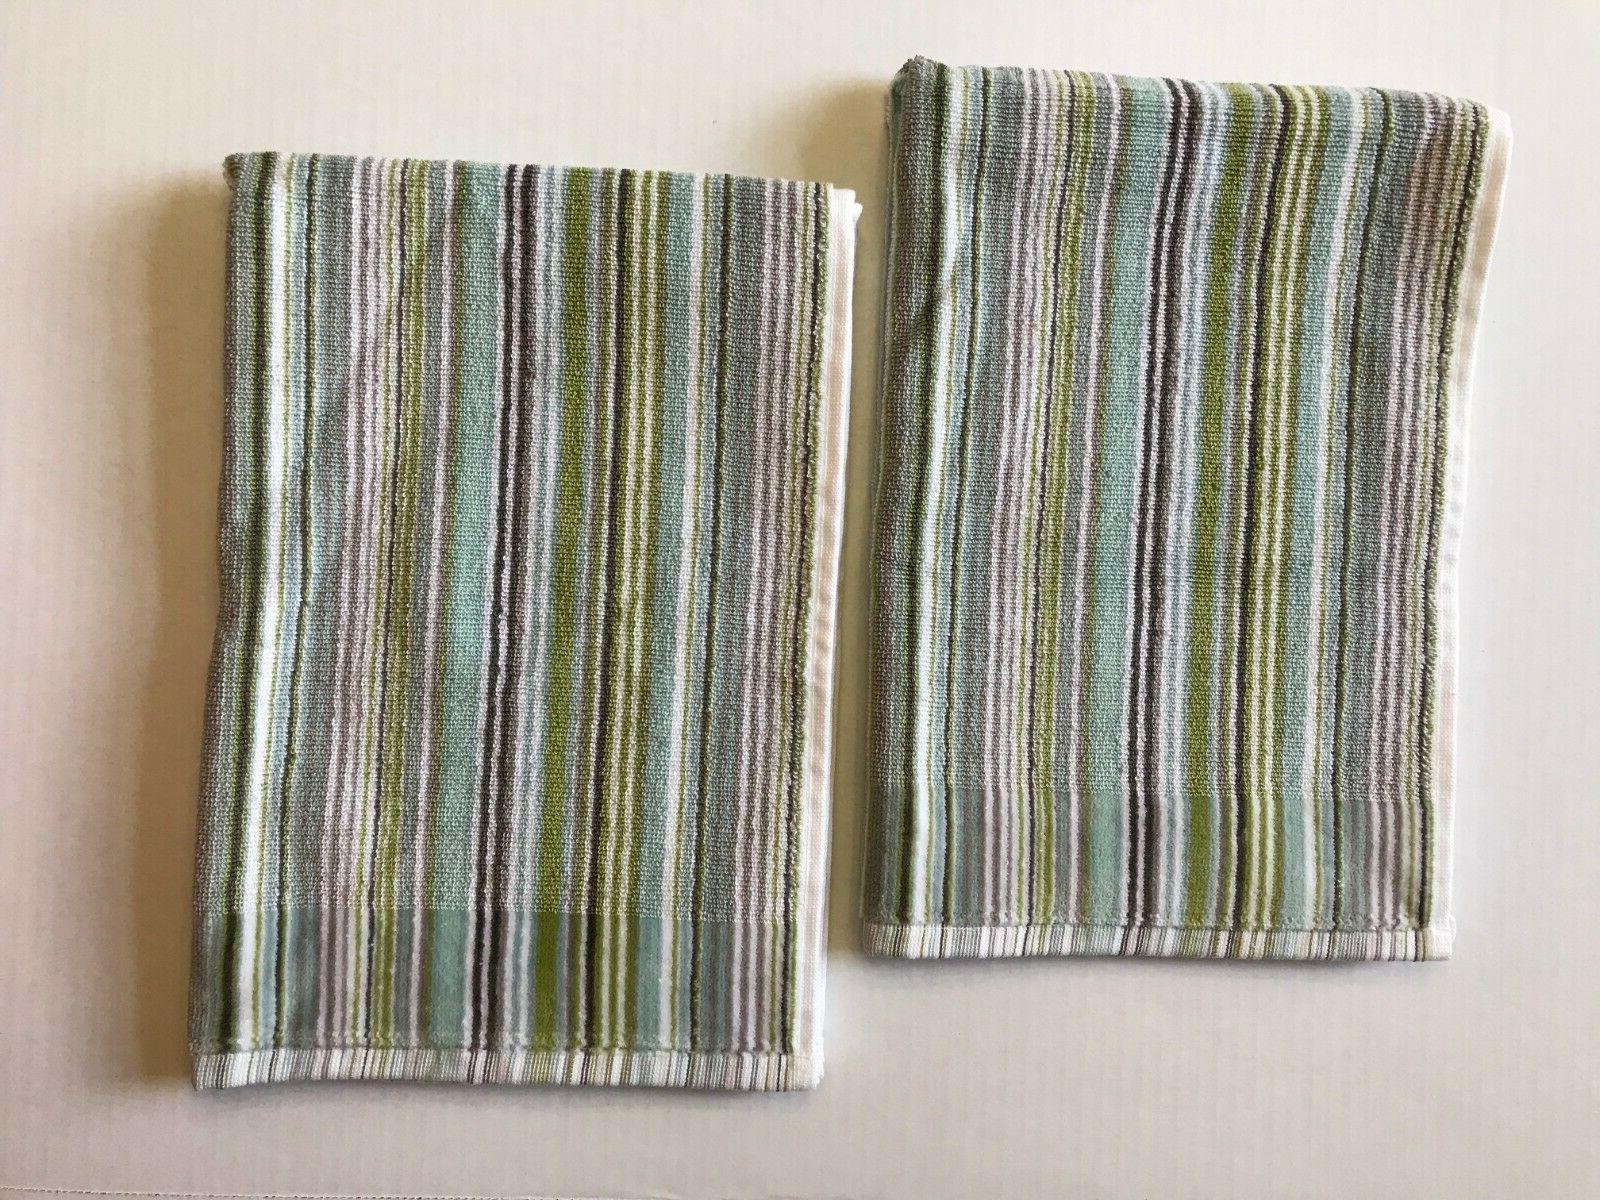 Set of 2 DKNY Houston Stripe Hand Towels - Dusty Charcoal -